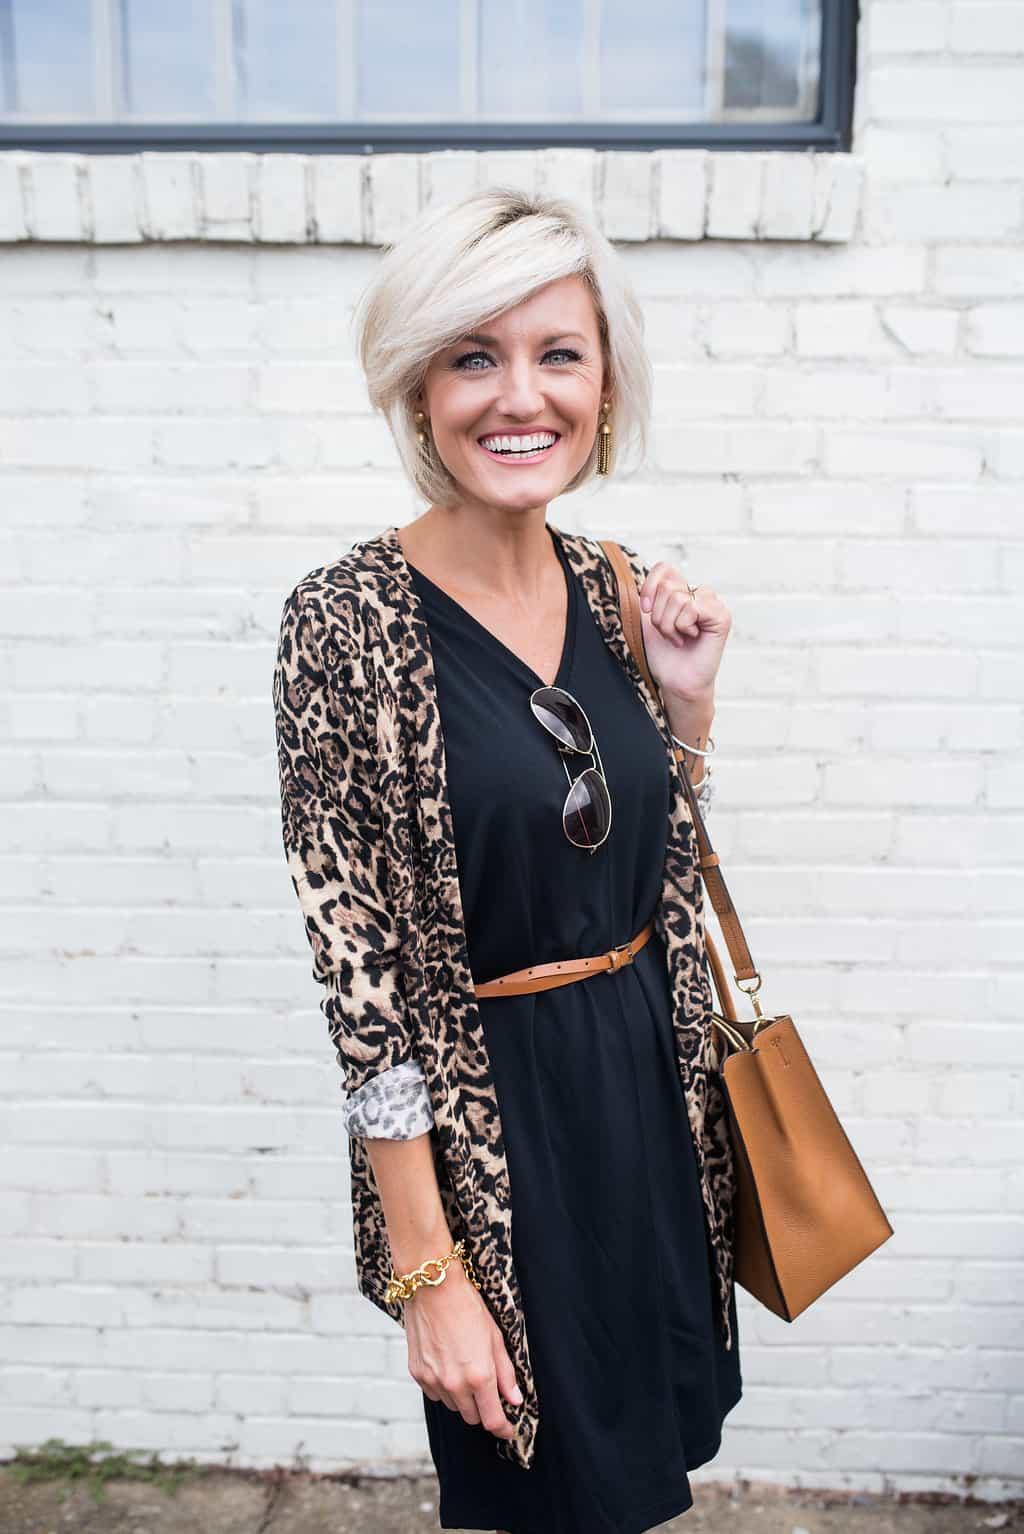 Leopard Print Cardigan Loverly Grey